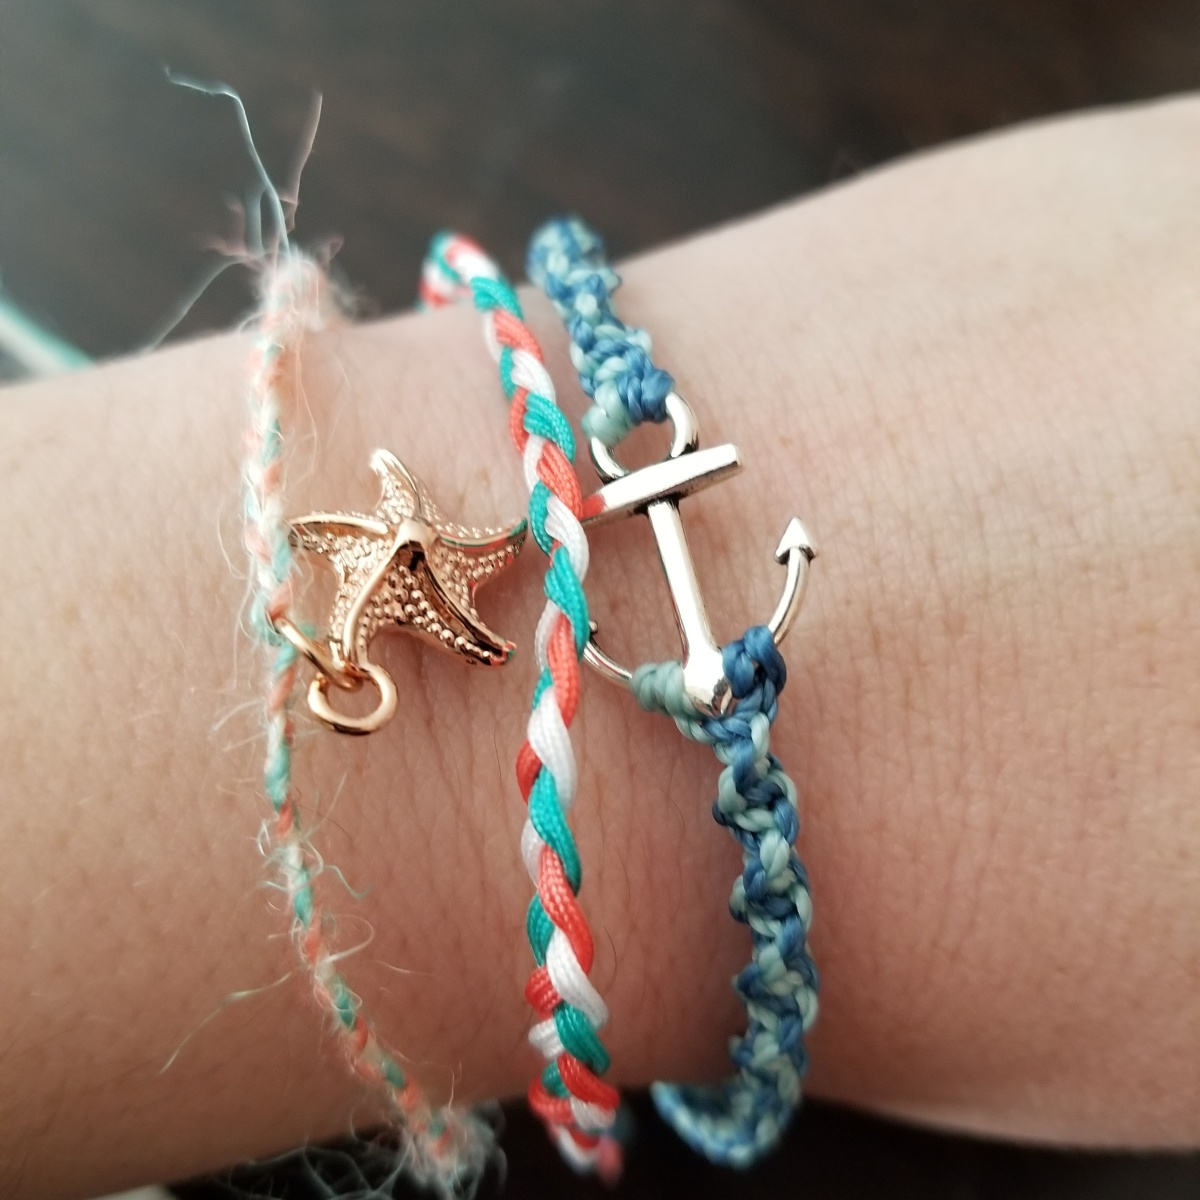 Beachy, Surfy, Yogi Bracelets